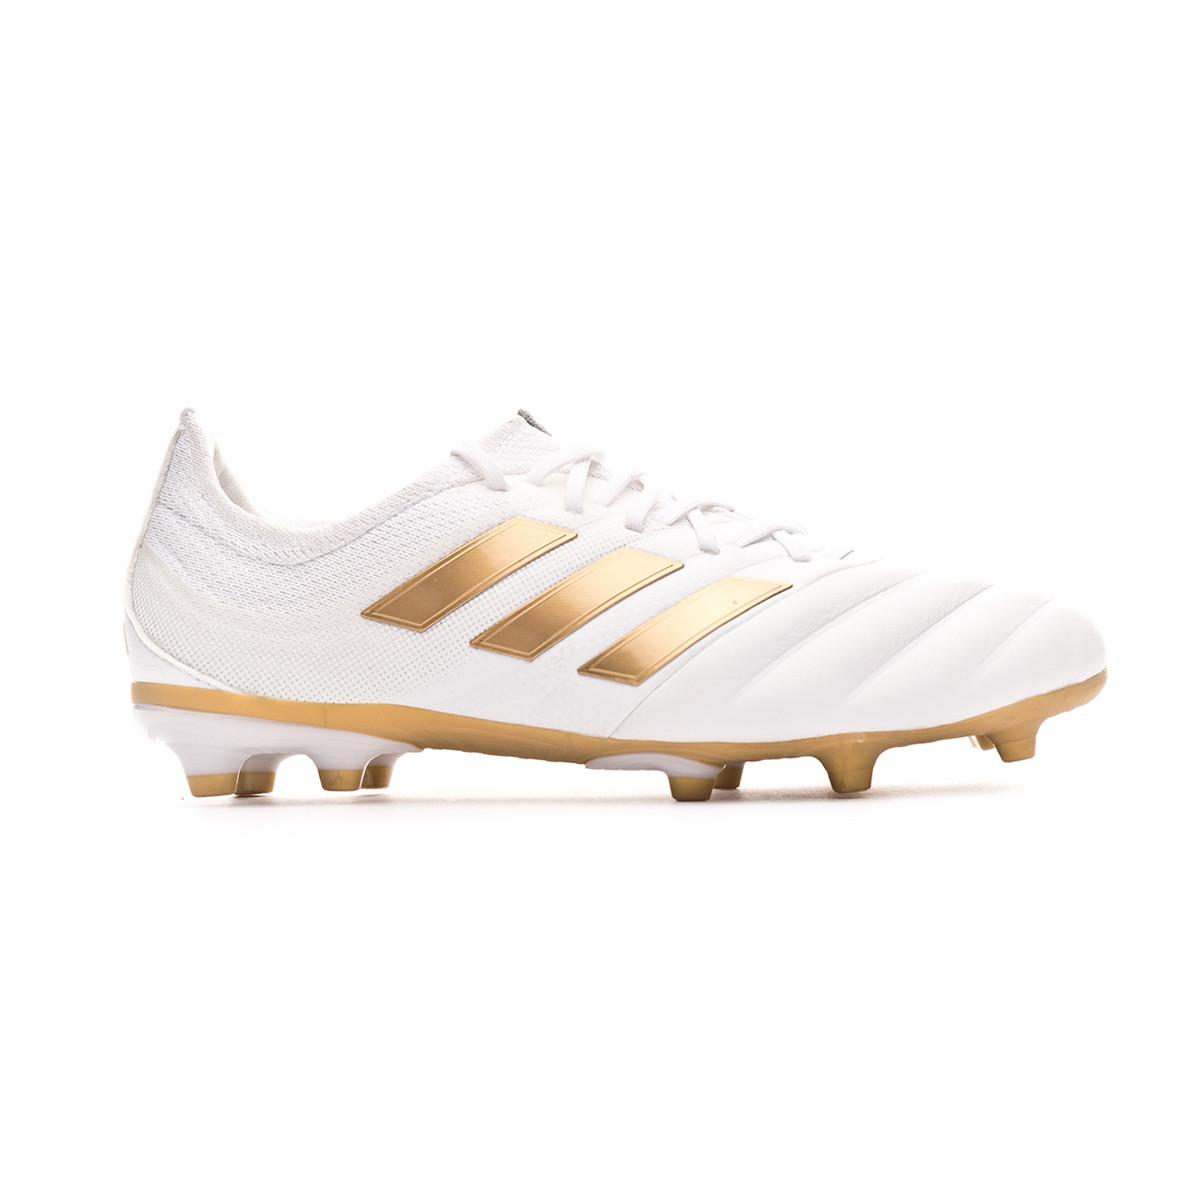 Football Boots Adidas Copa 19 1 Fg Nino White Gold Metallic Football Blue Football Store Futbol Emotion